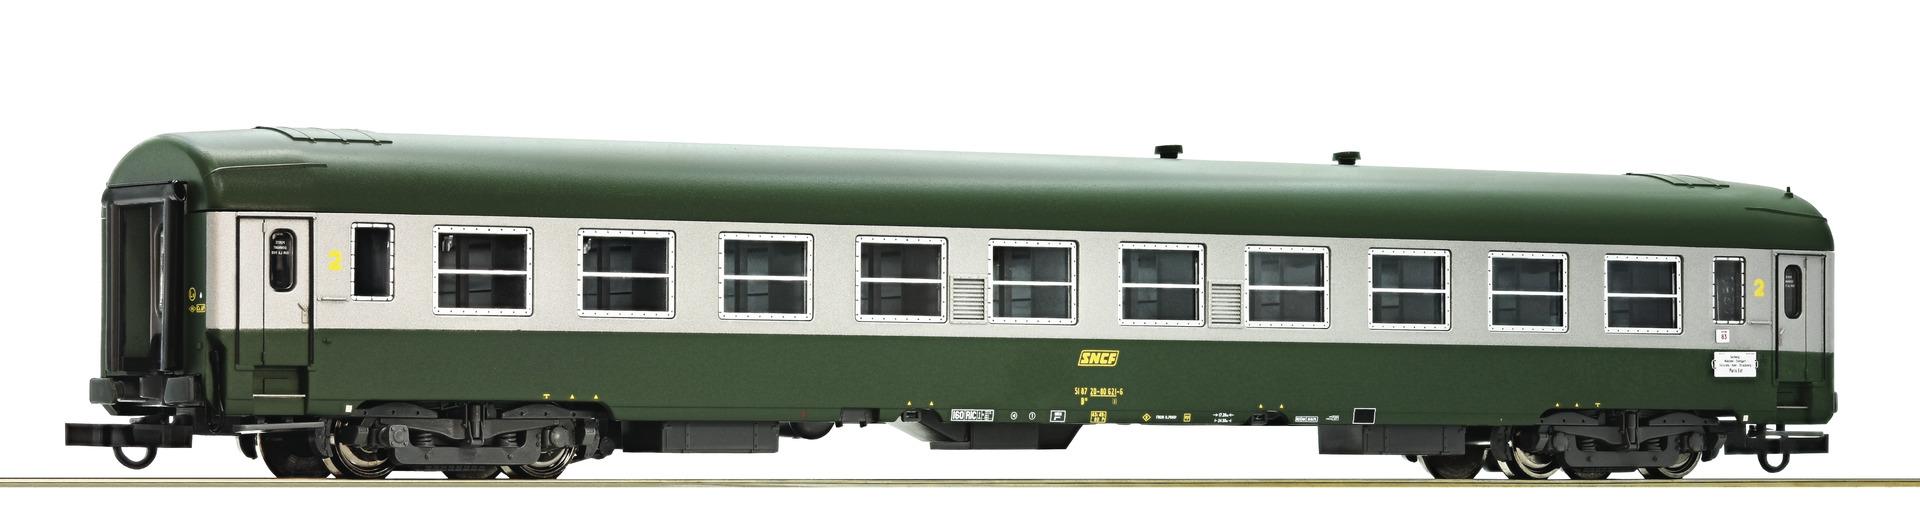 Roco74353 passenger car cl2 SNCF